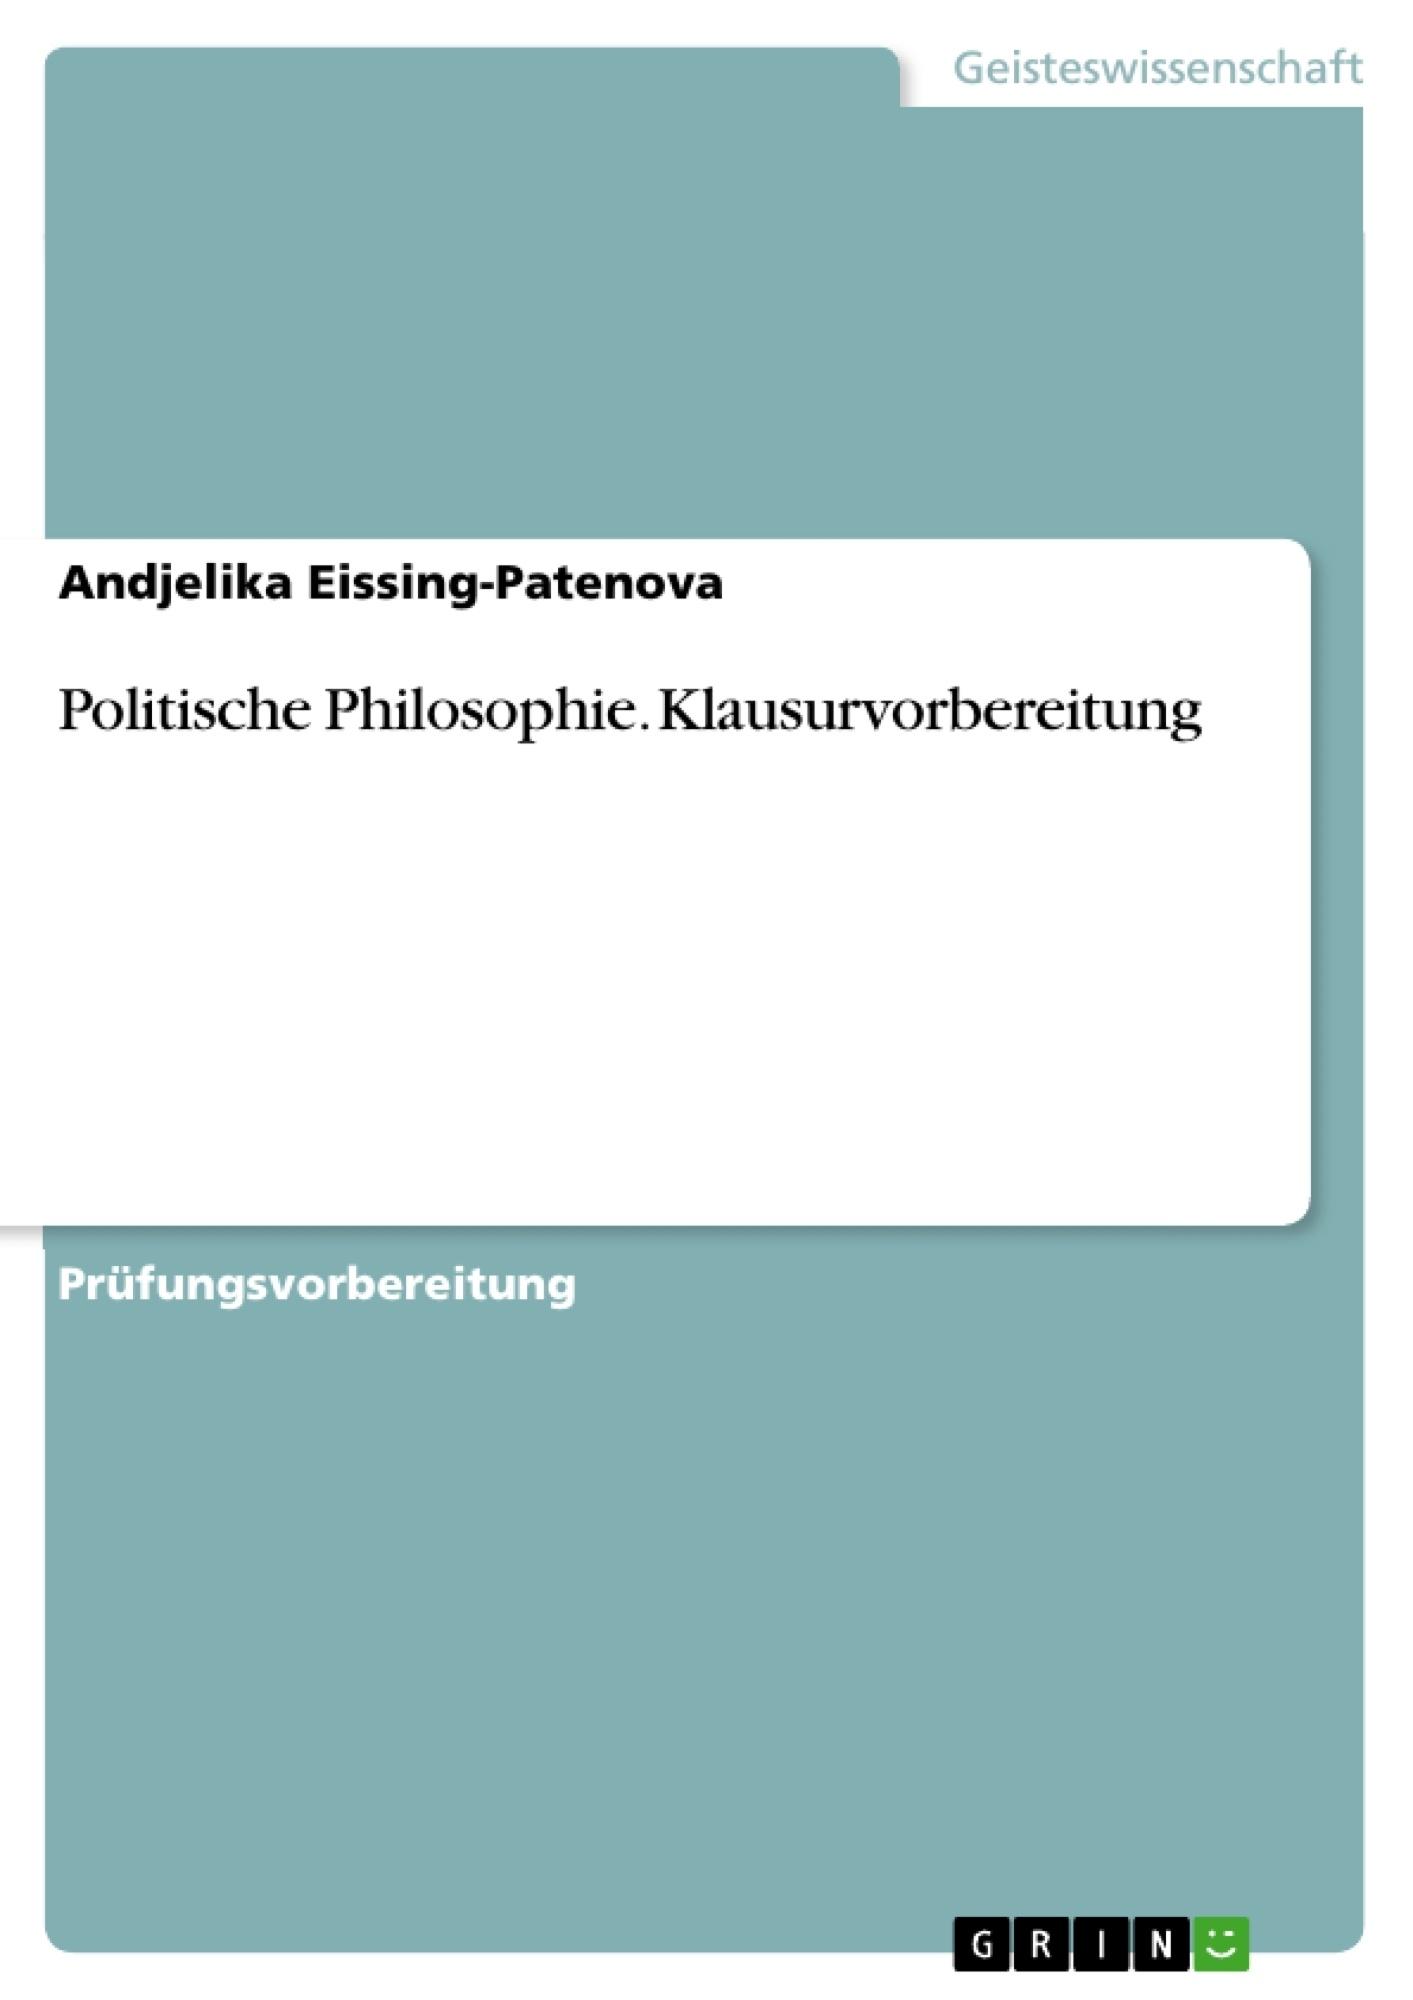 Titel: Politische Philosophie. Klausurvorbereitung